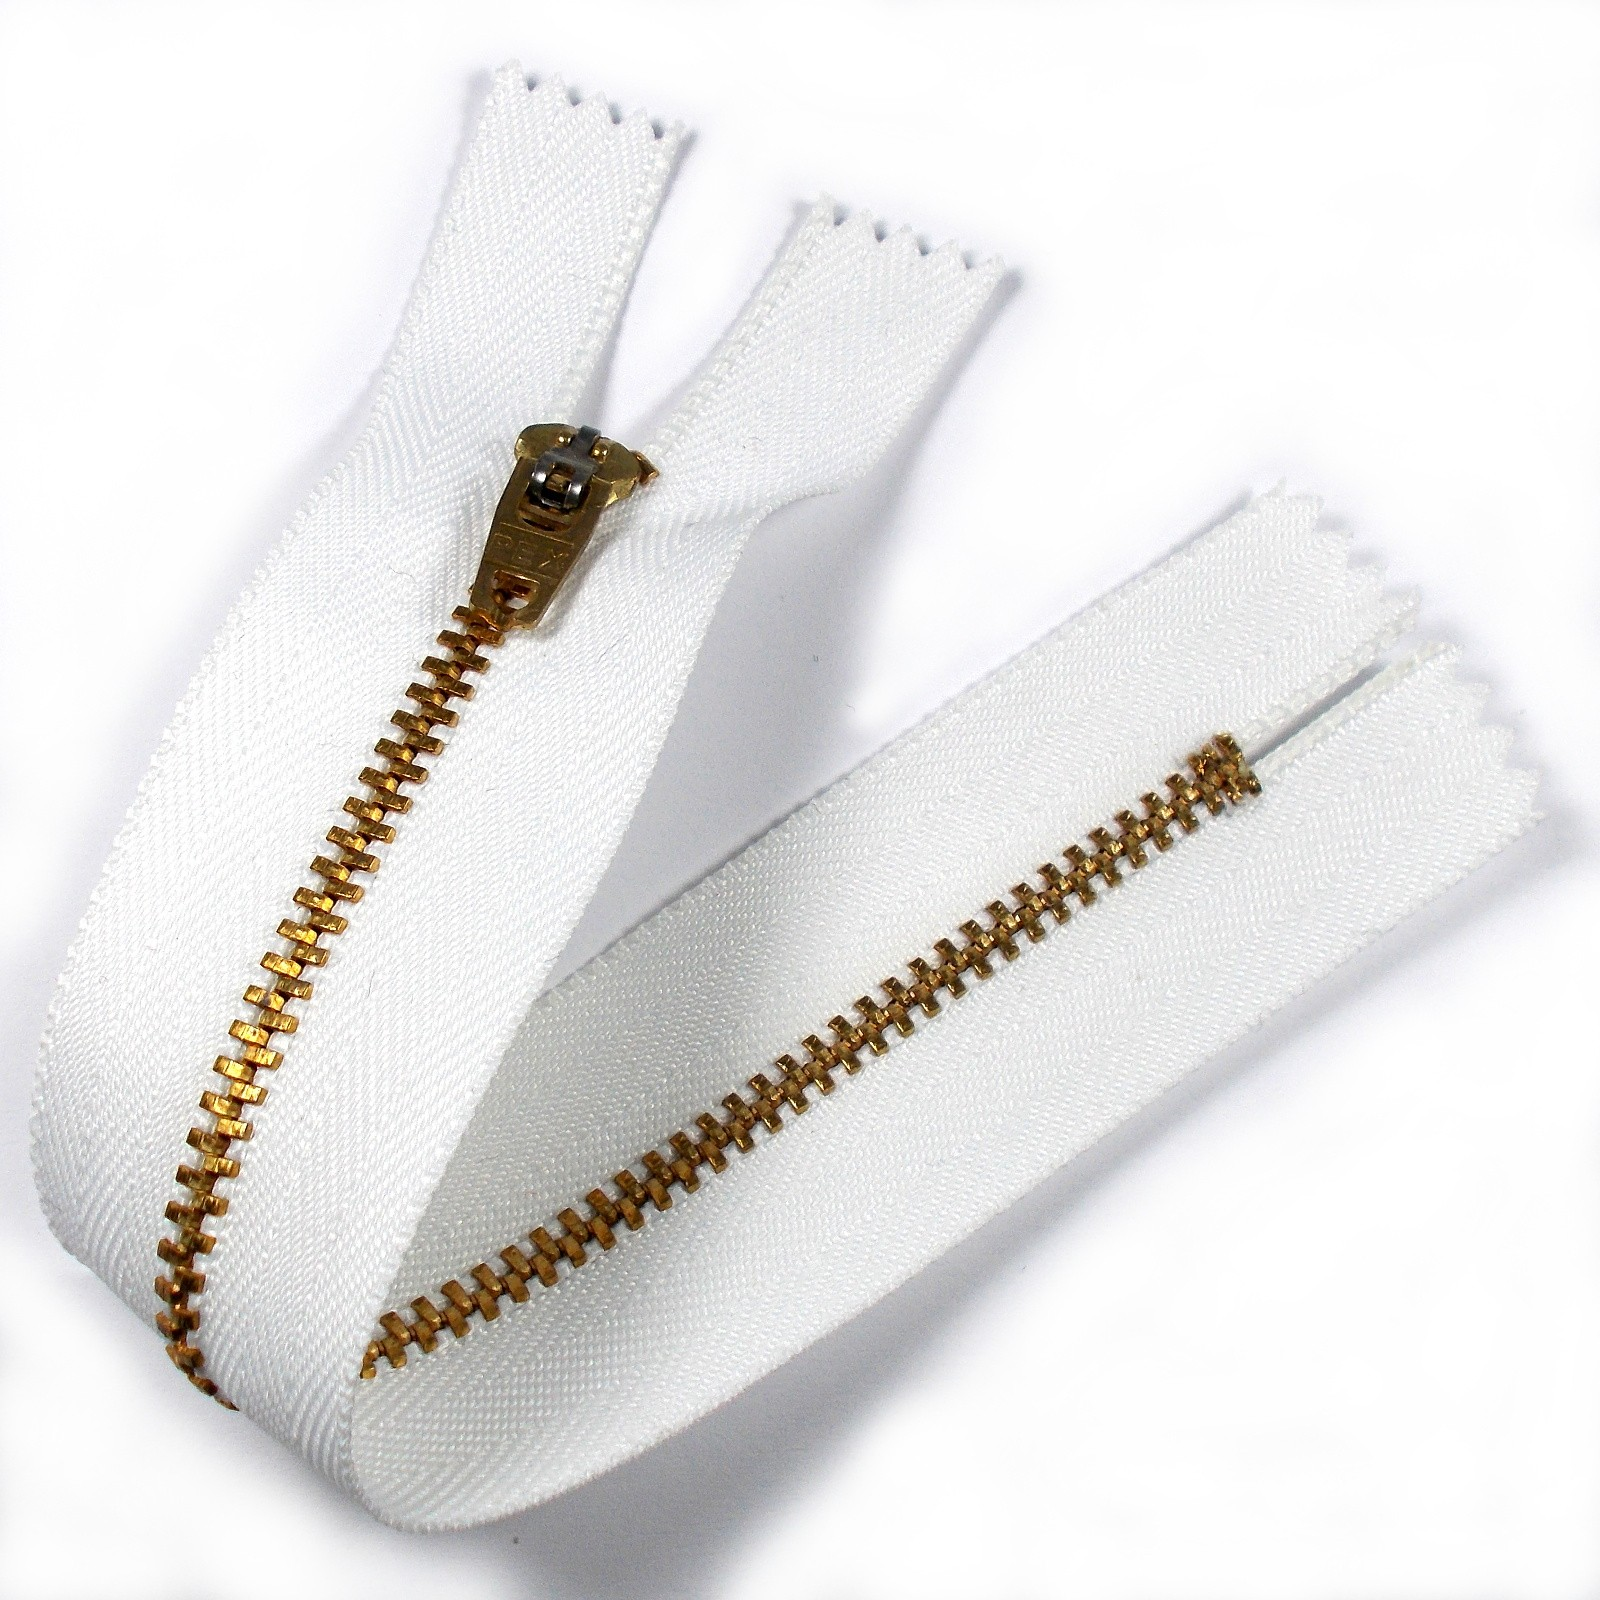 Gold Metal Trouser Jeans Zip Zipper 8 inch White